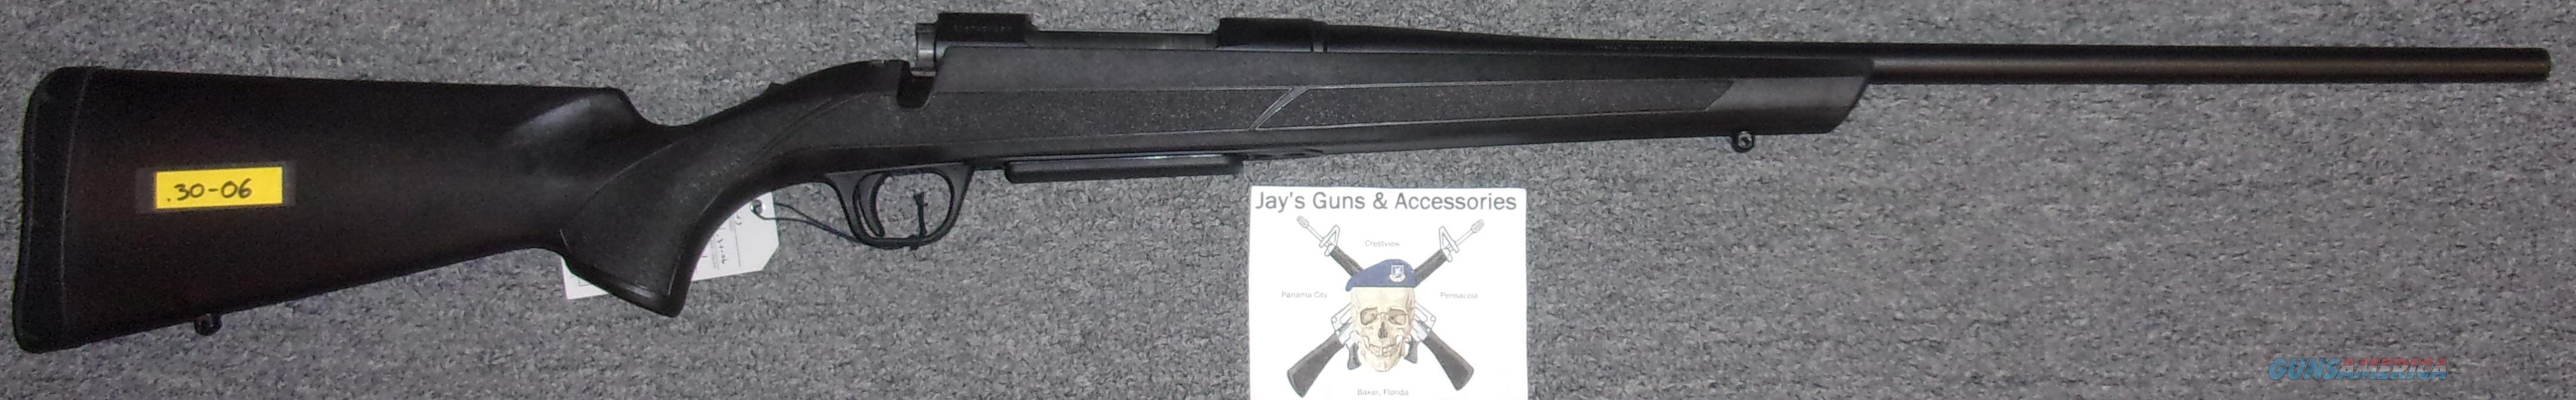 Browning A-Bolt III  Guns > Rifles > Browning Rifles > Bolt Action > Hunting > Blue